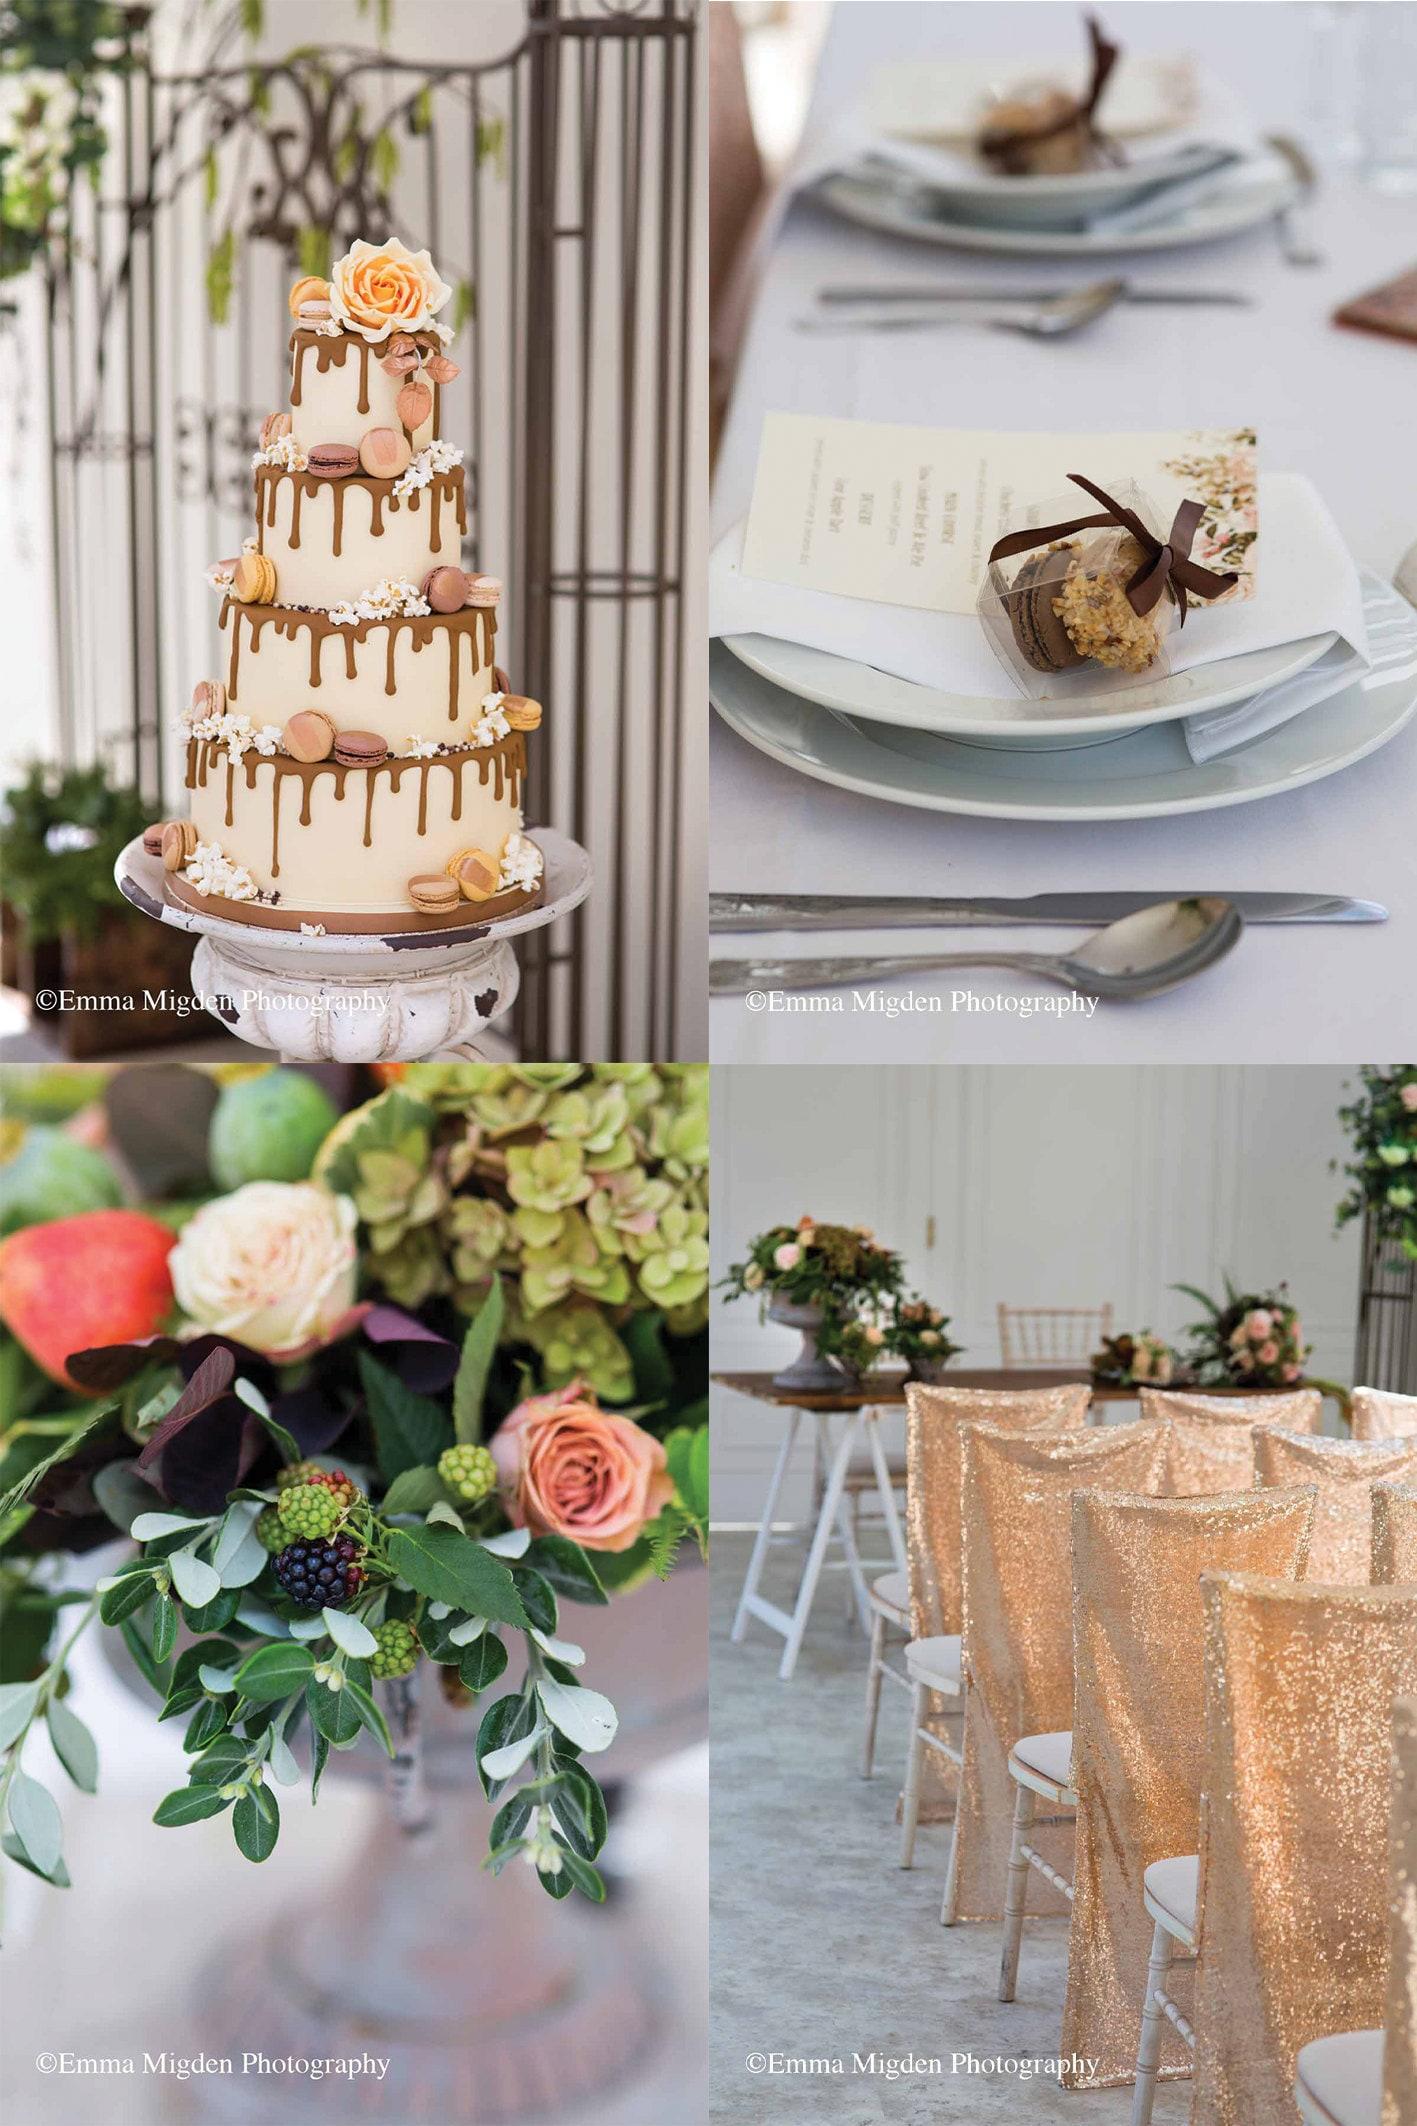 mimifleur.co.uk,http://www.bowschaircovers.co.uk/, http://touchays.com/, https://bluebirdsbakehouse.co.uk, inkipinki-weddings.co.uk